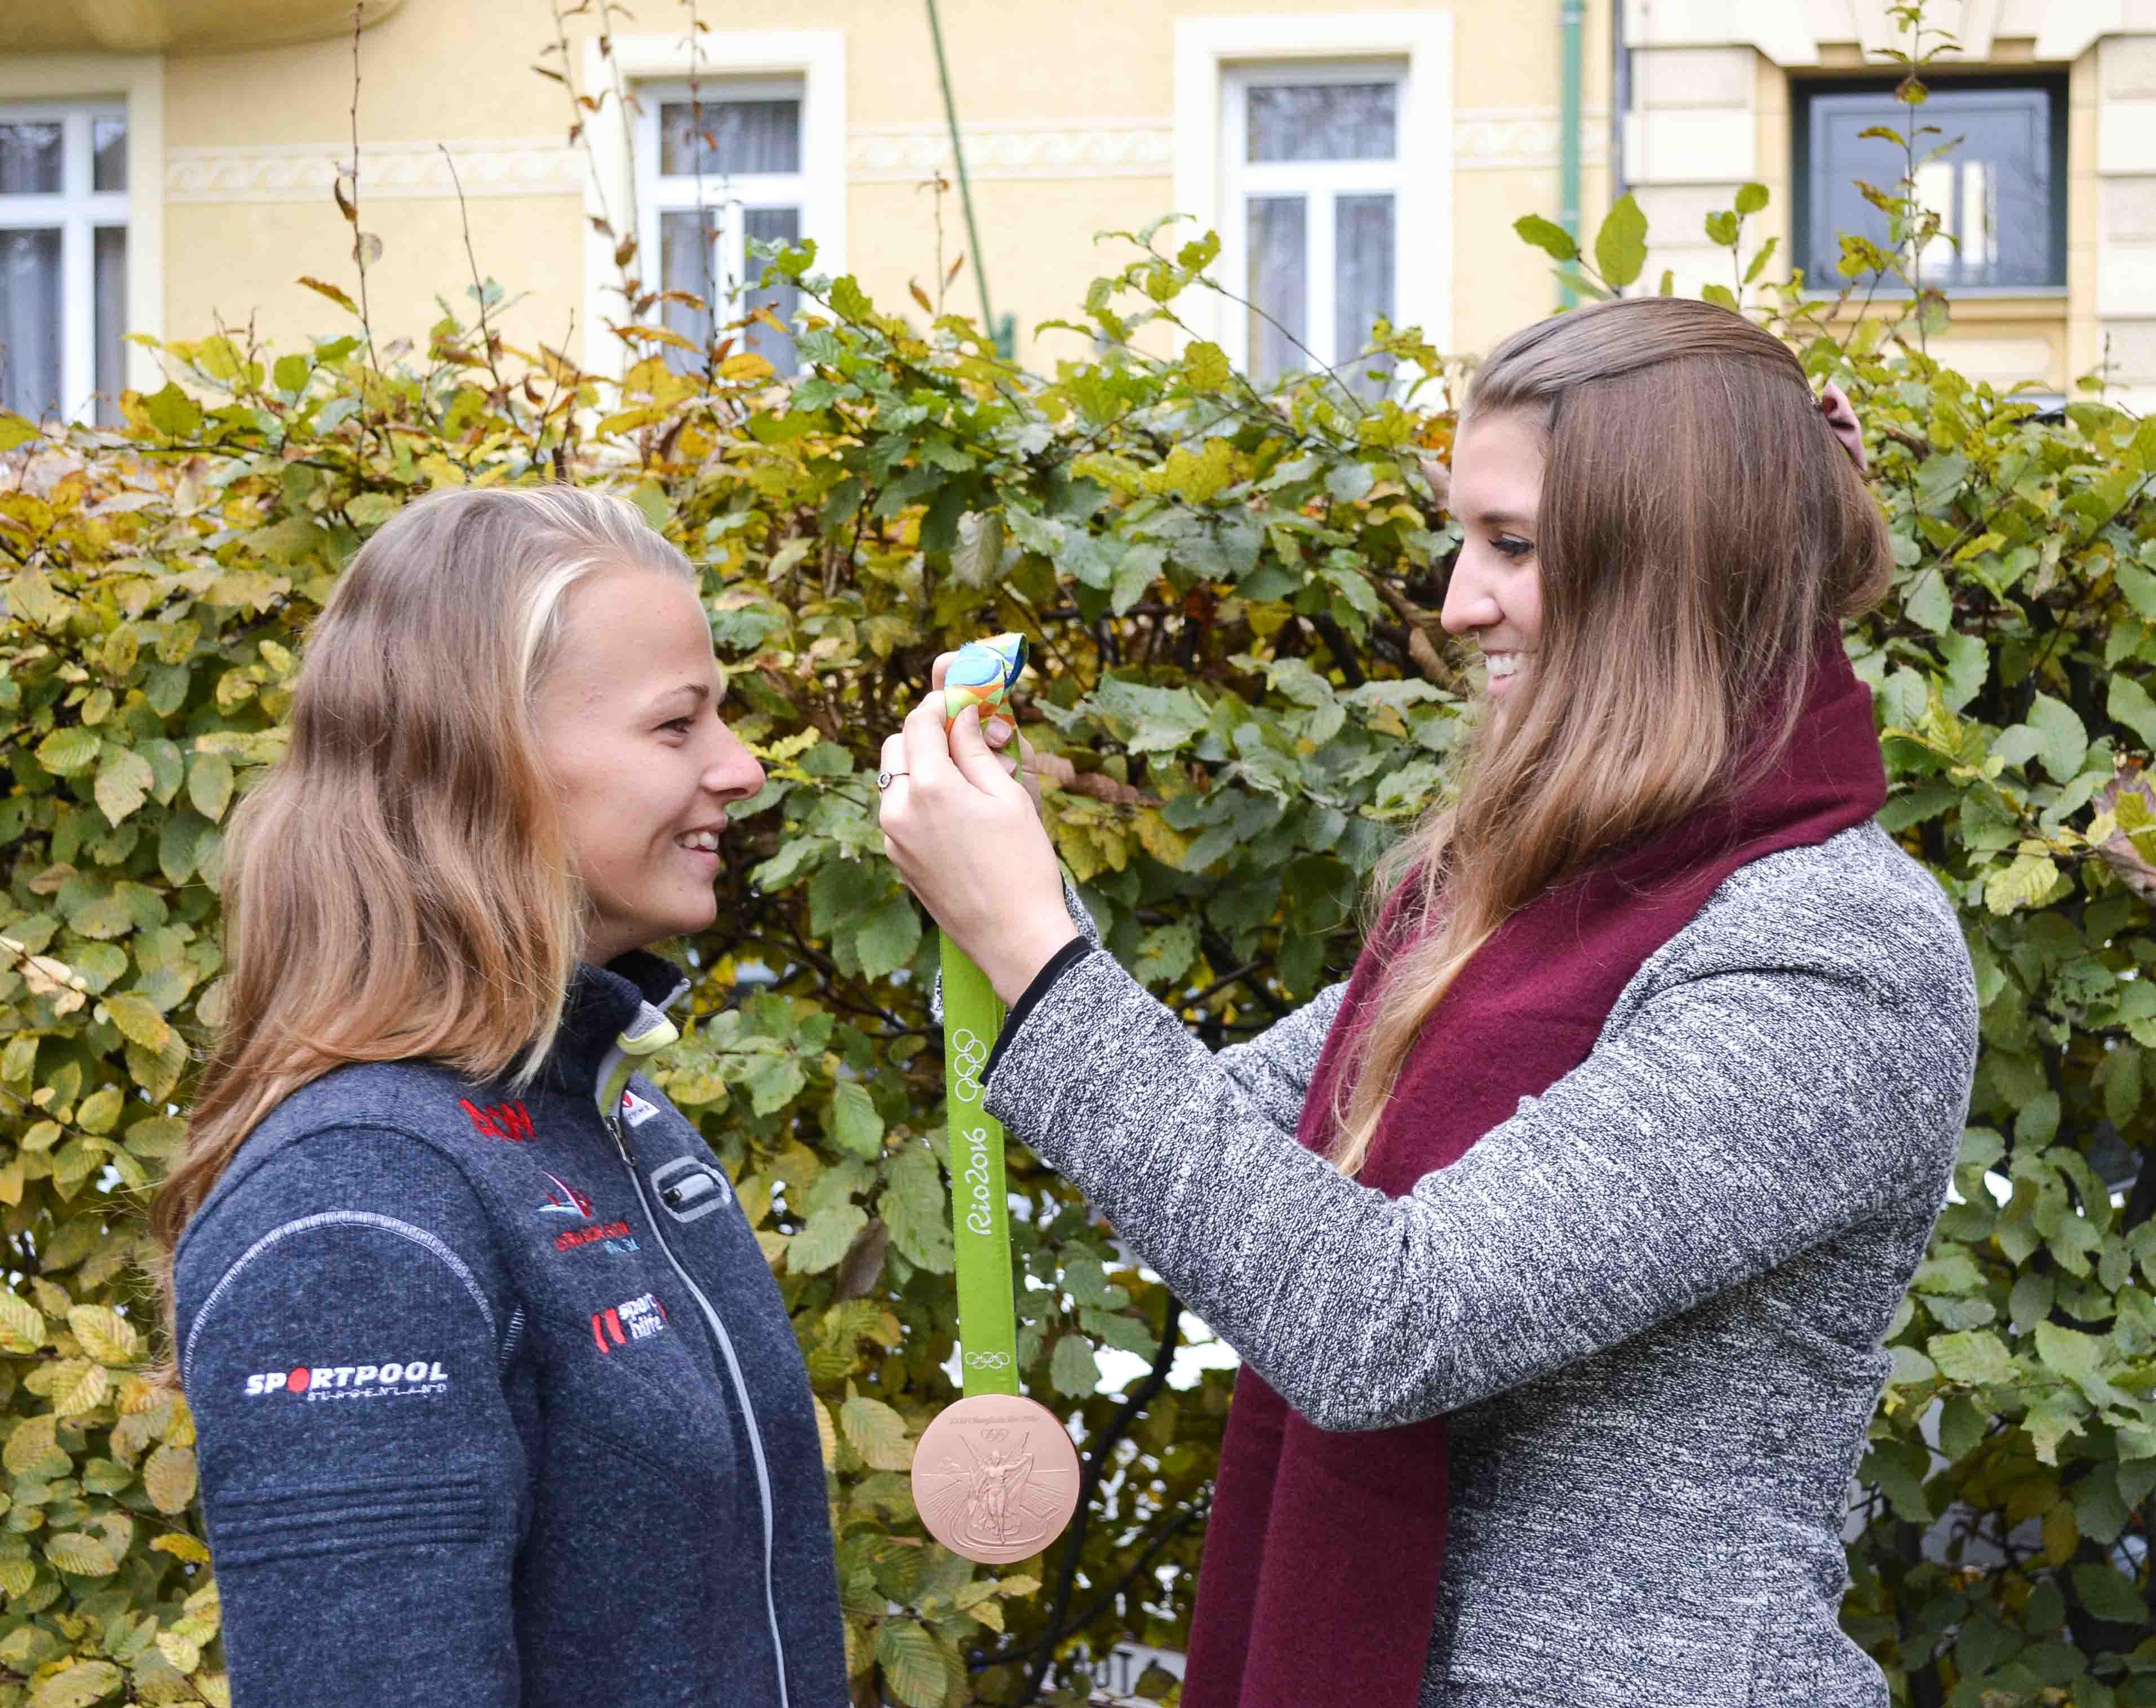 Tanja Frank Olympiamedaillen Gewinnerin RIO 2016 Interview